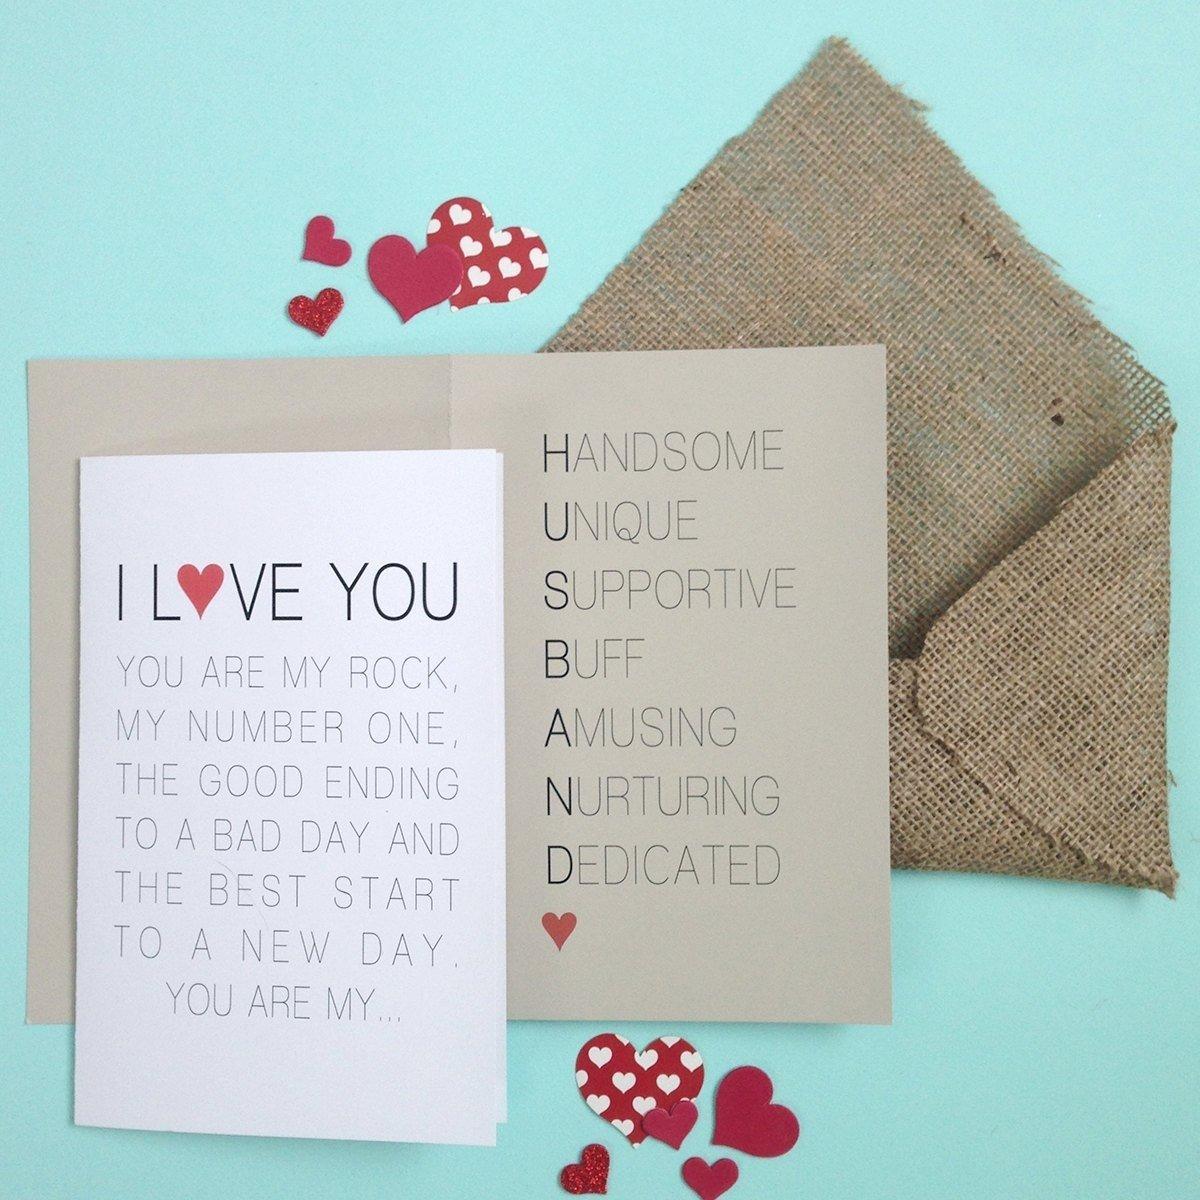 10 Stunning Valentine Card Ideas For Him